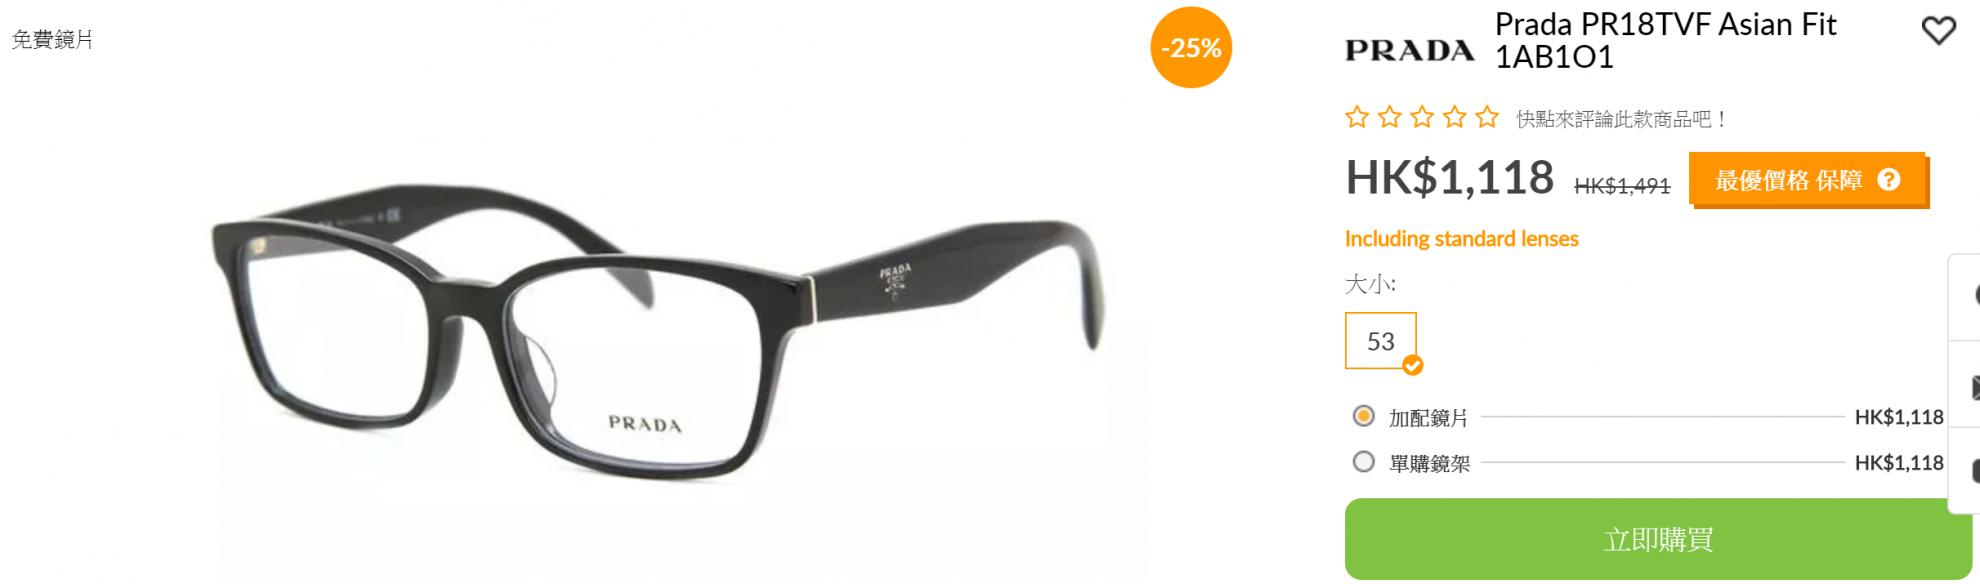 SmartBuyGlasses PRADA